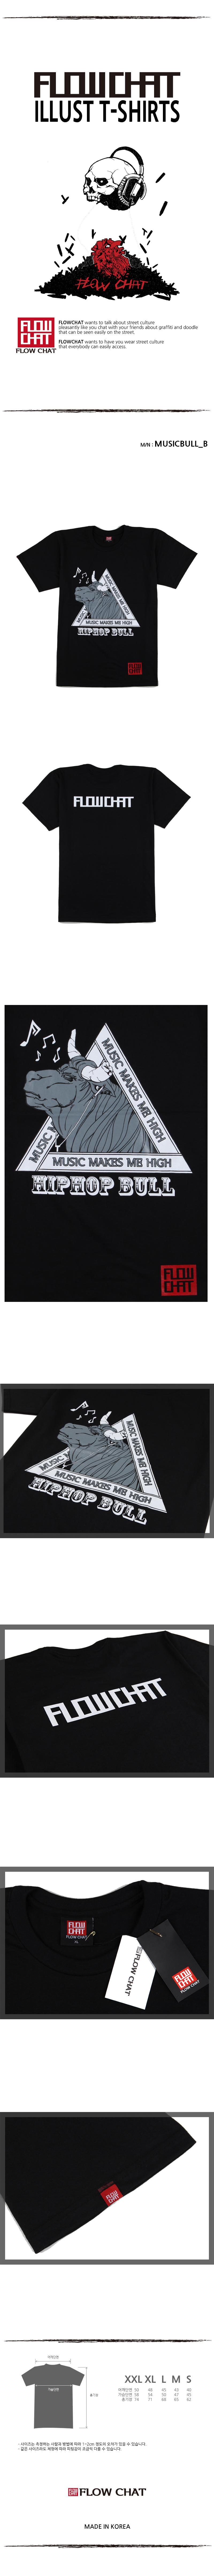 MUSIC BULL HALF TEE (BLACK)15,400원-플로우챗패션의류, 스트릿패션, 스트릿패션, 디자인반팔티셔츠바보사랑MUSIC BULL HALF TEE (BLACK)15,400원-플로우챗패션의류, 스트릿패션, 스트릿패션, 디자인반팔티셔츠바보사랑